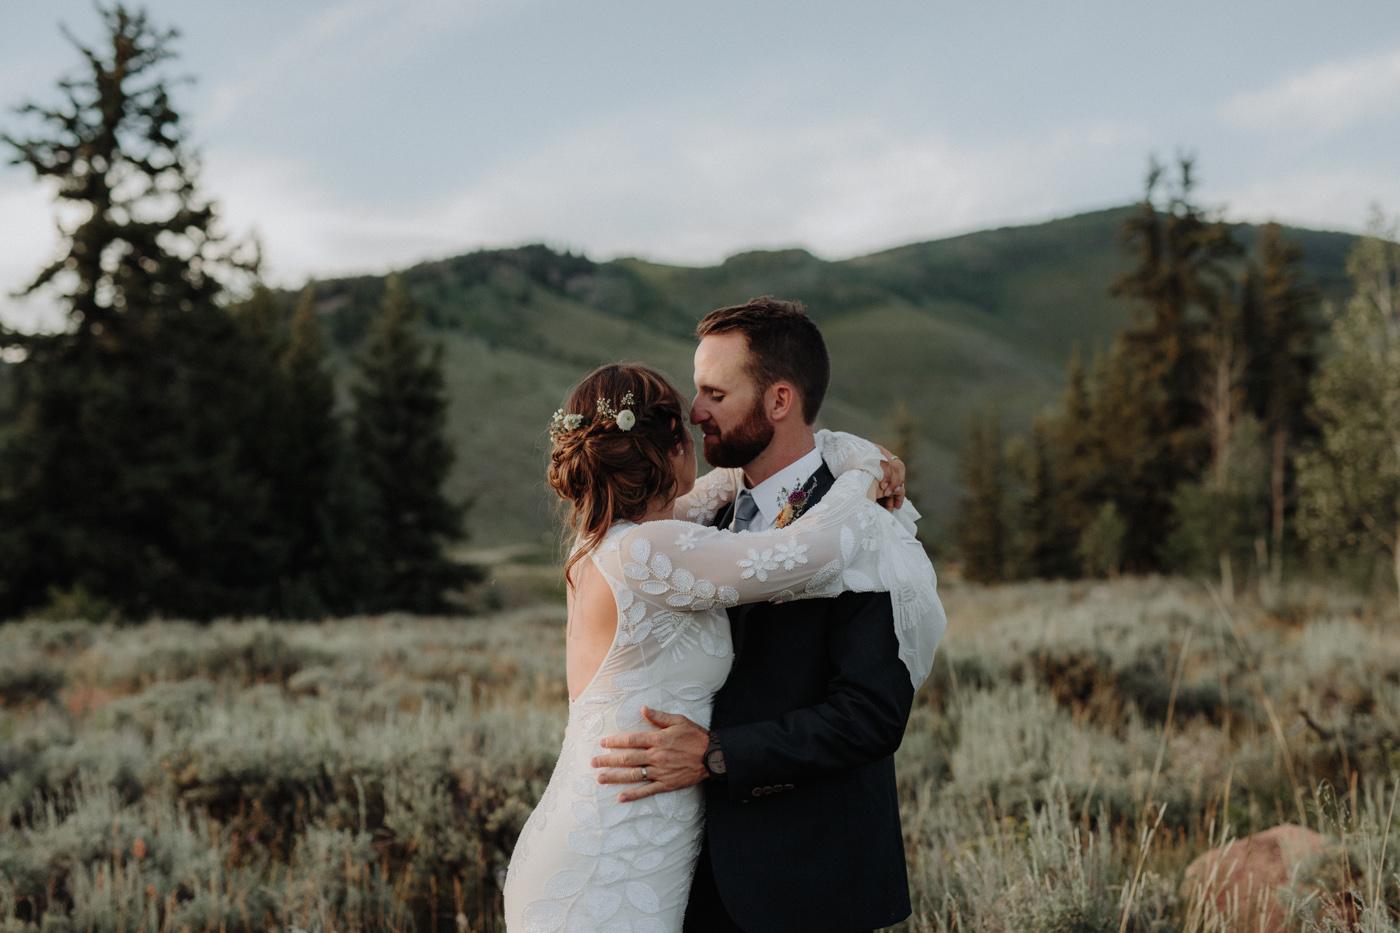 woods-walk-trail-crested-butte-colorado-wedding-131.jpg